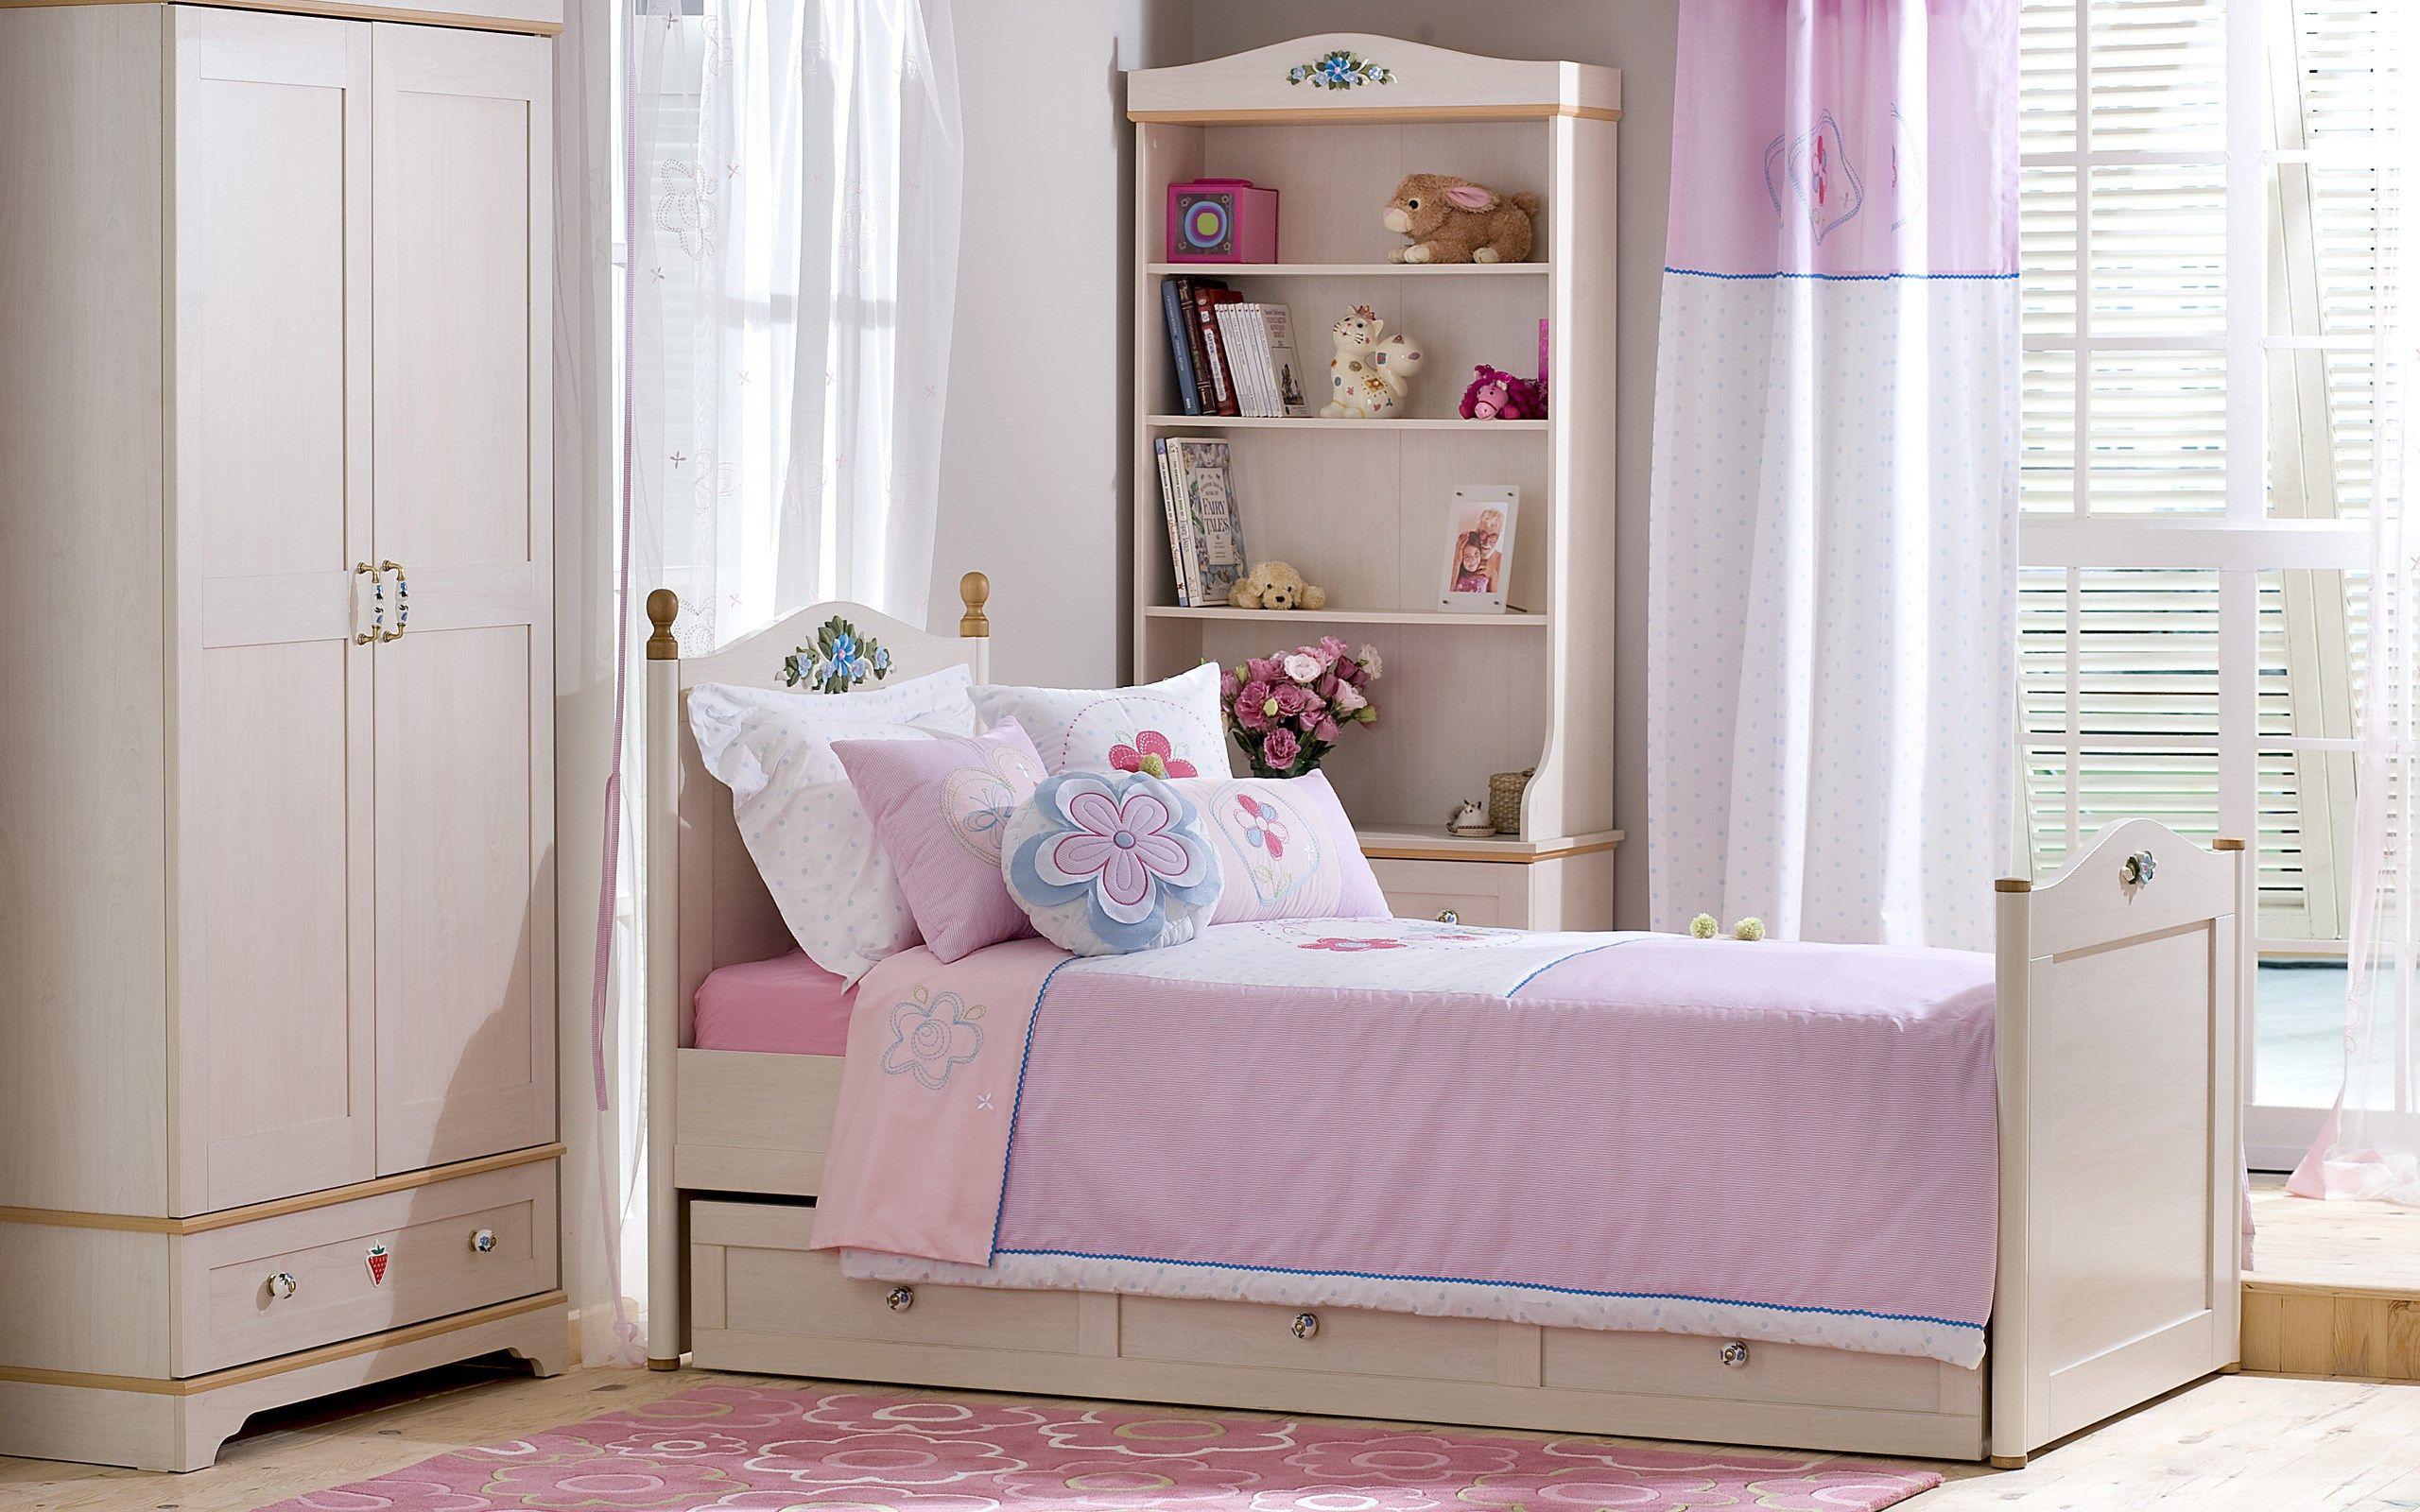 Bedroom interior hd pics room free for desktop  hueputalo  pinterest  more room wallpaper